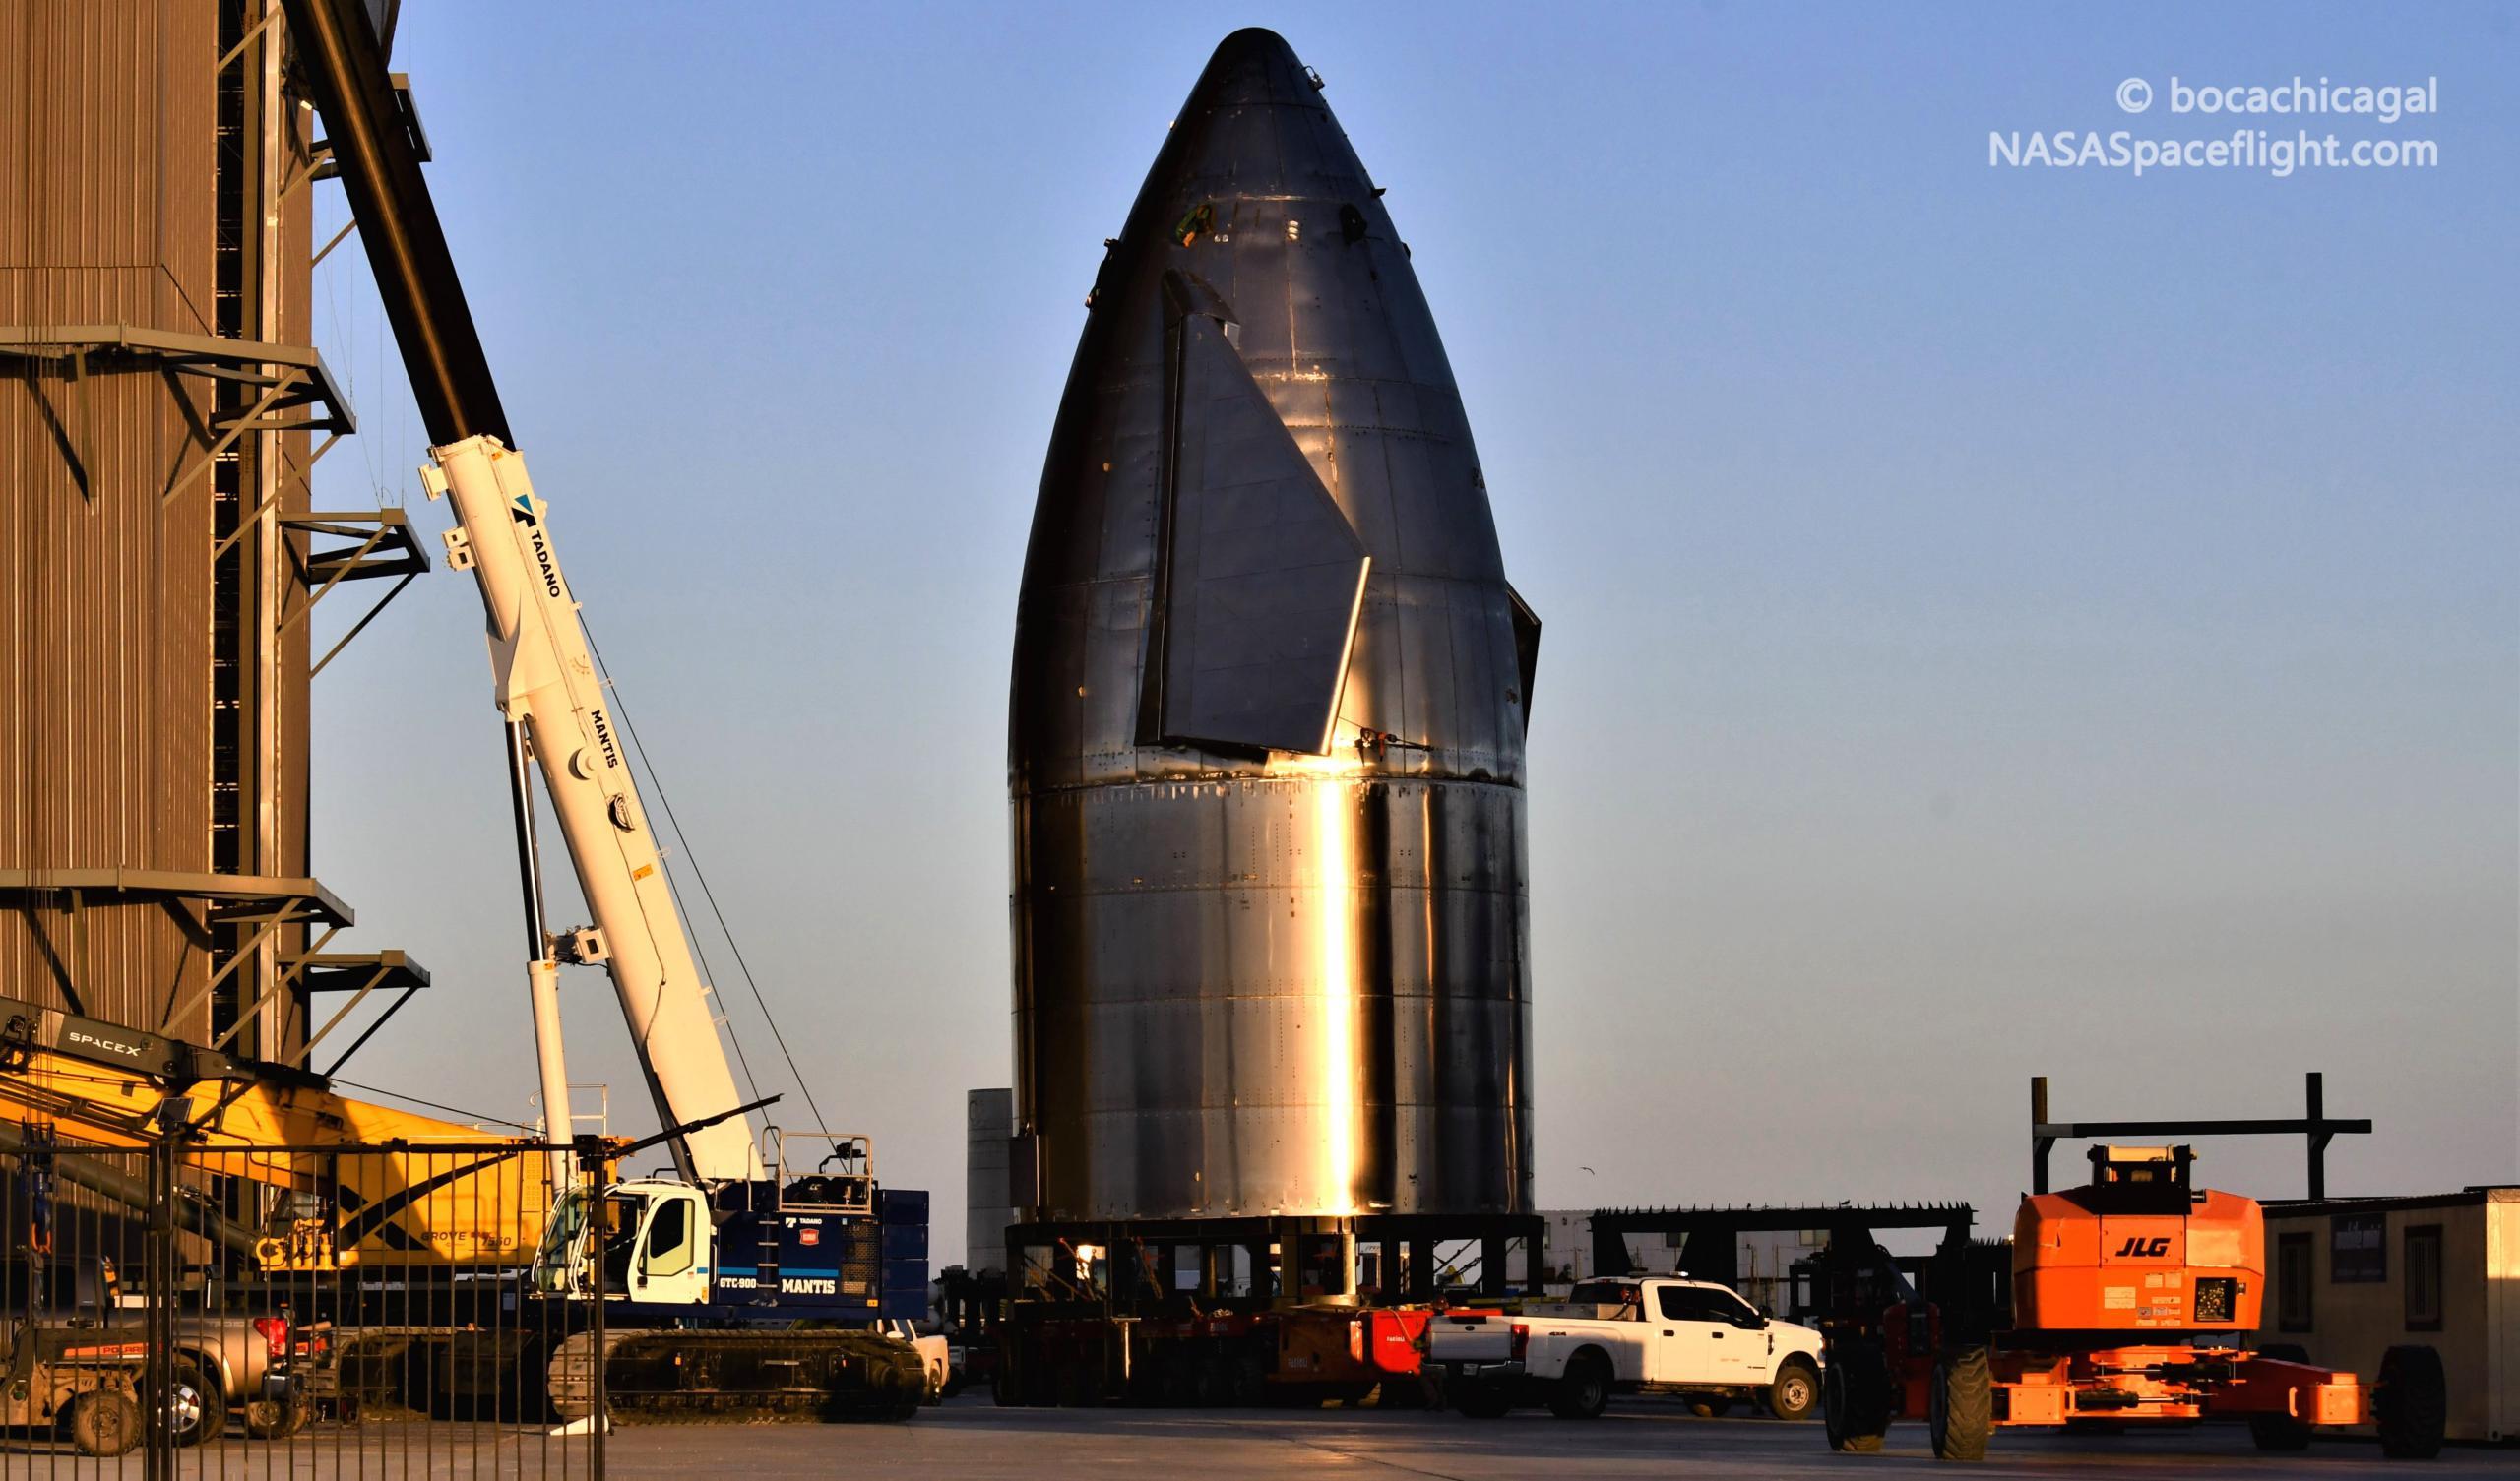 Starship Boca Chica 020721 (NASASpaceflight – bocachicagal) SN11 nose install 1 crop (c)